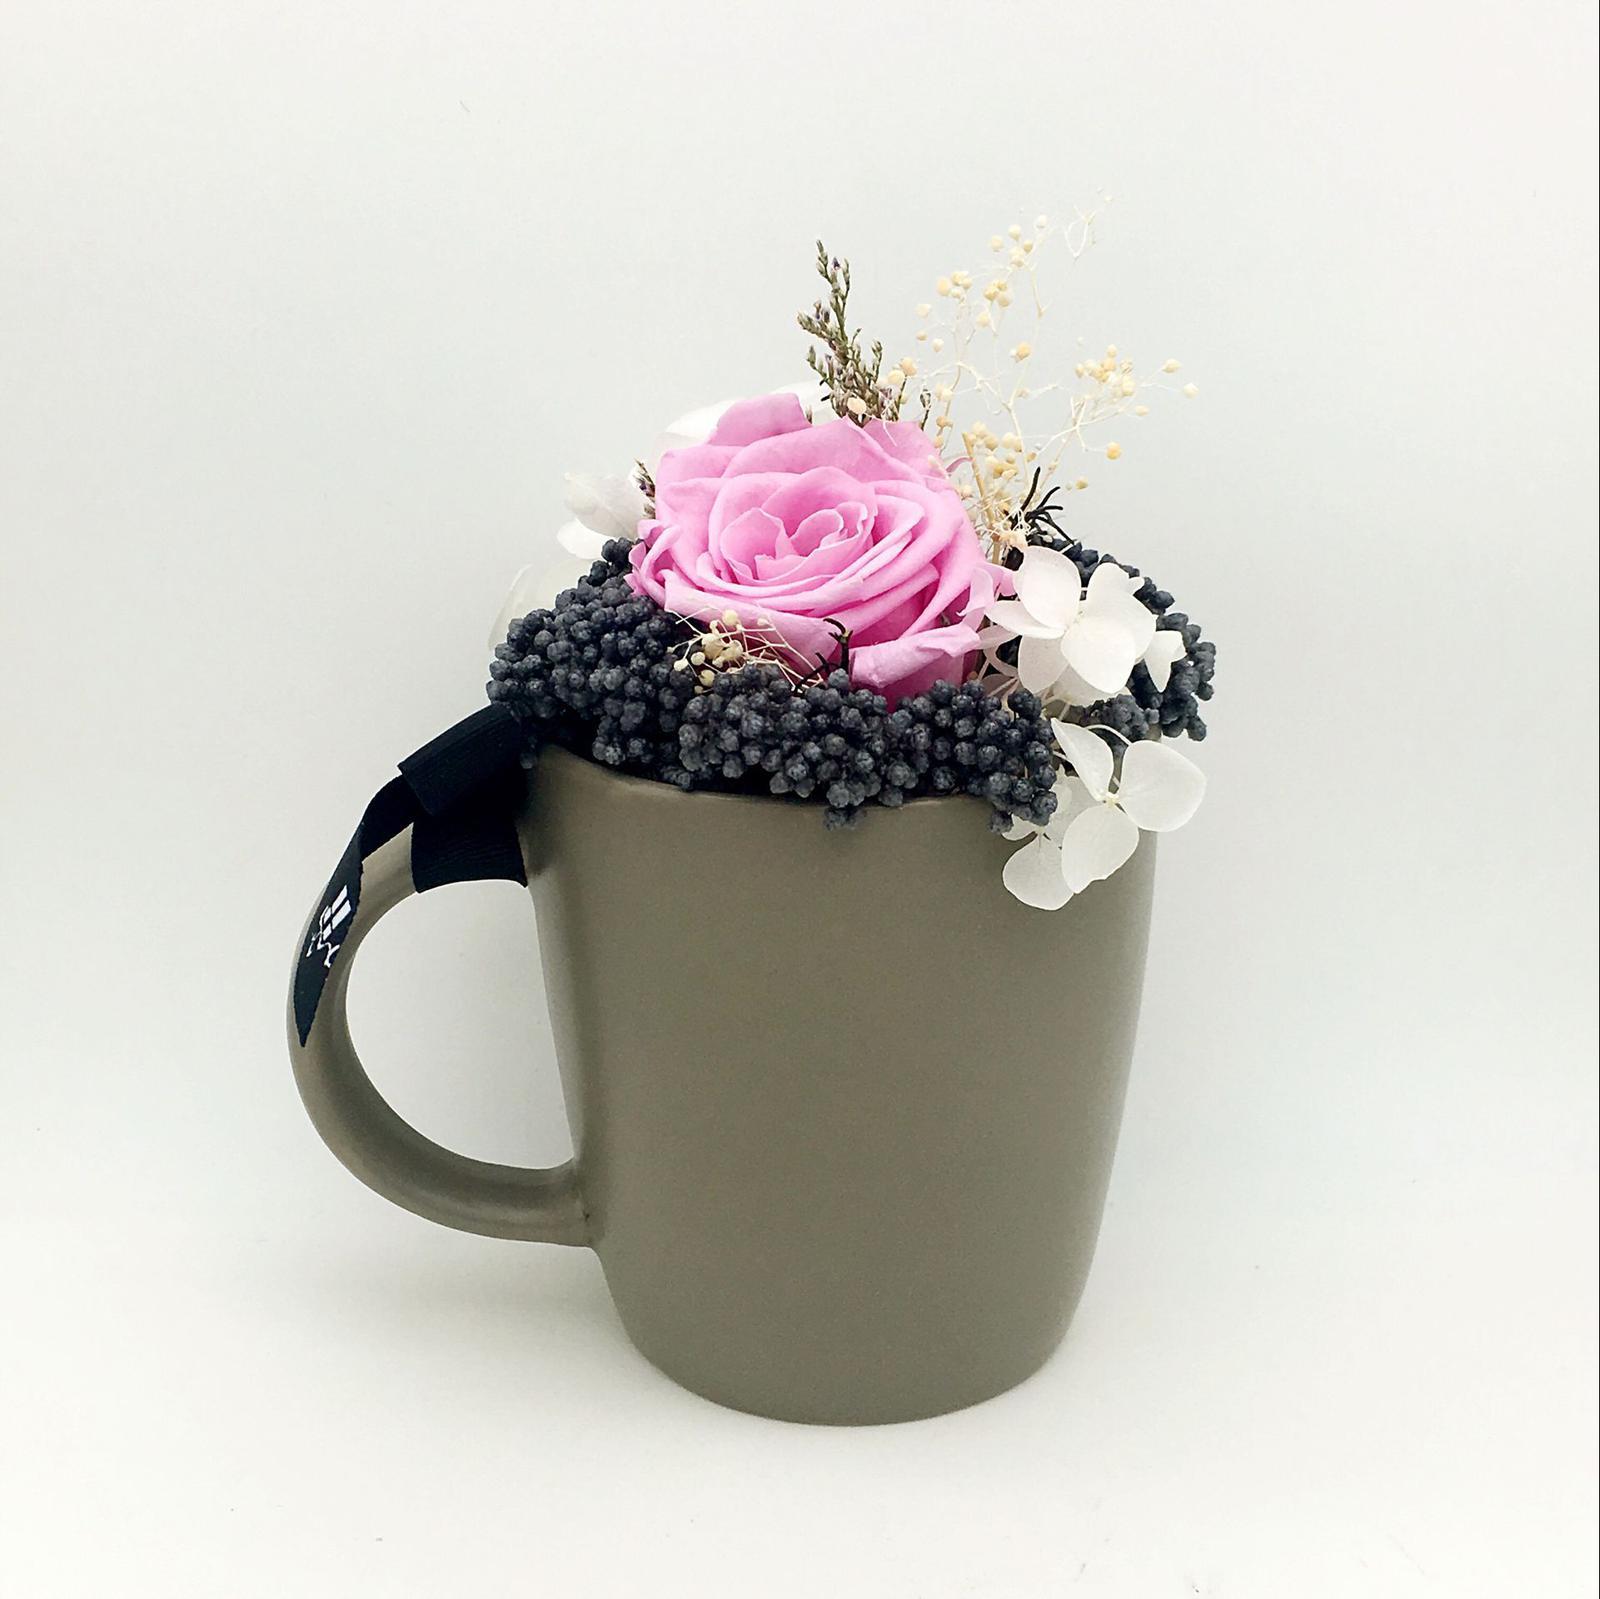 Mugs and roses